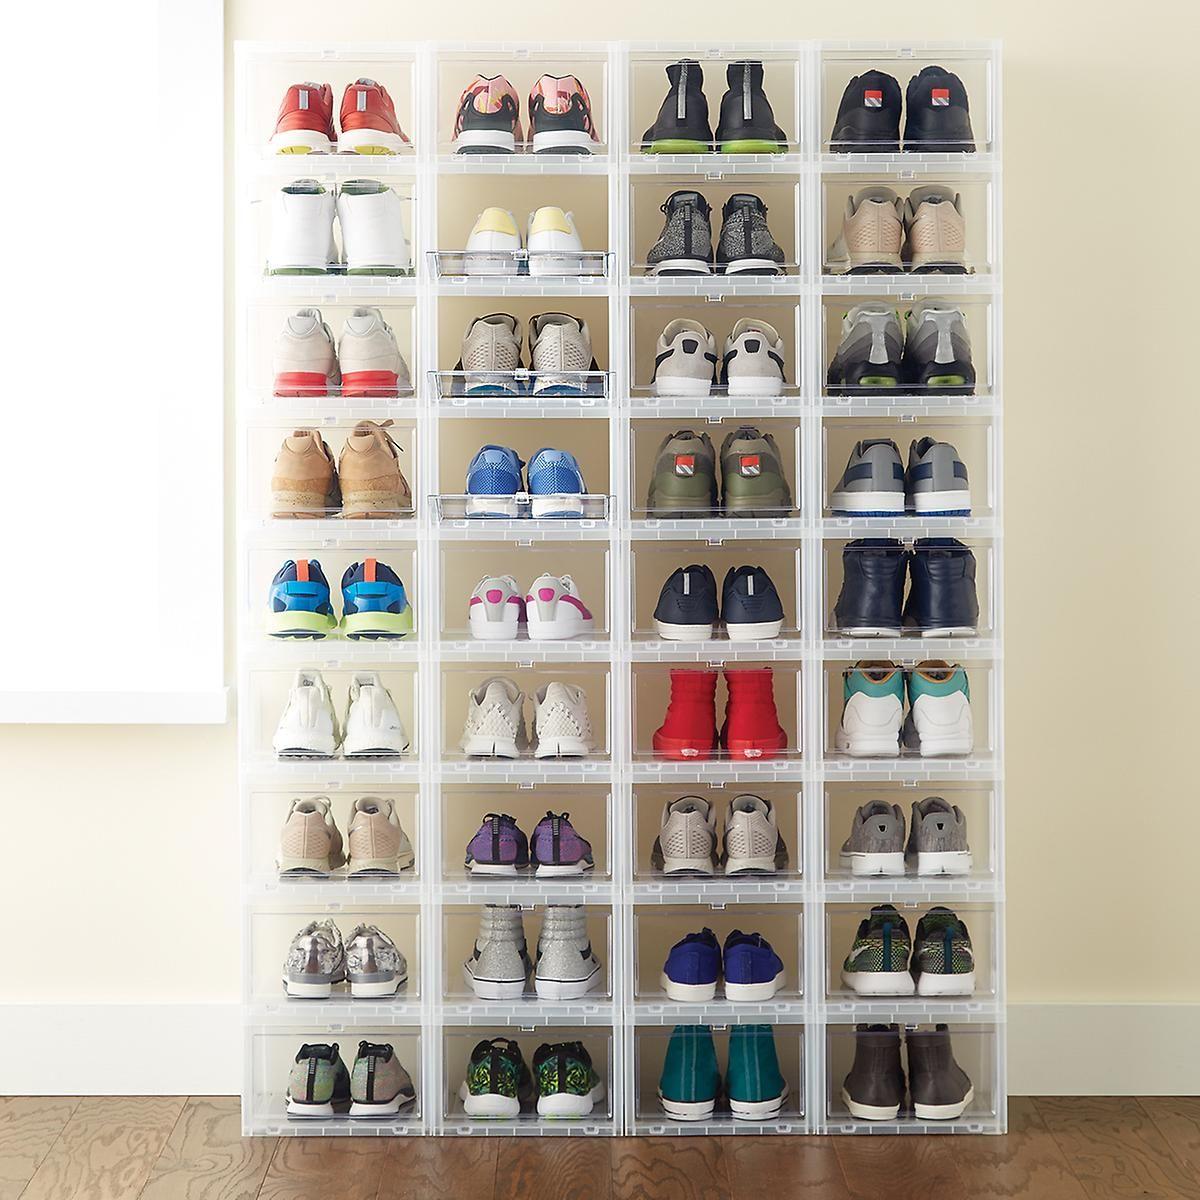 Shoe storage $ 8 open shoe drawers https://www.containerstore.com/s/closet/shoe-storage / bins-boxes / mens-drop-front-shoe-box / 123d? Productid-11006294 AIBFSAQ